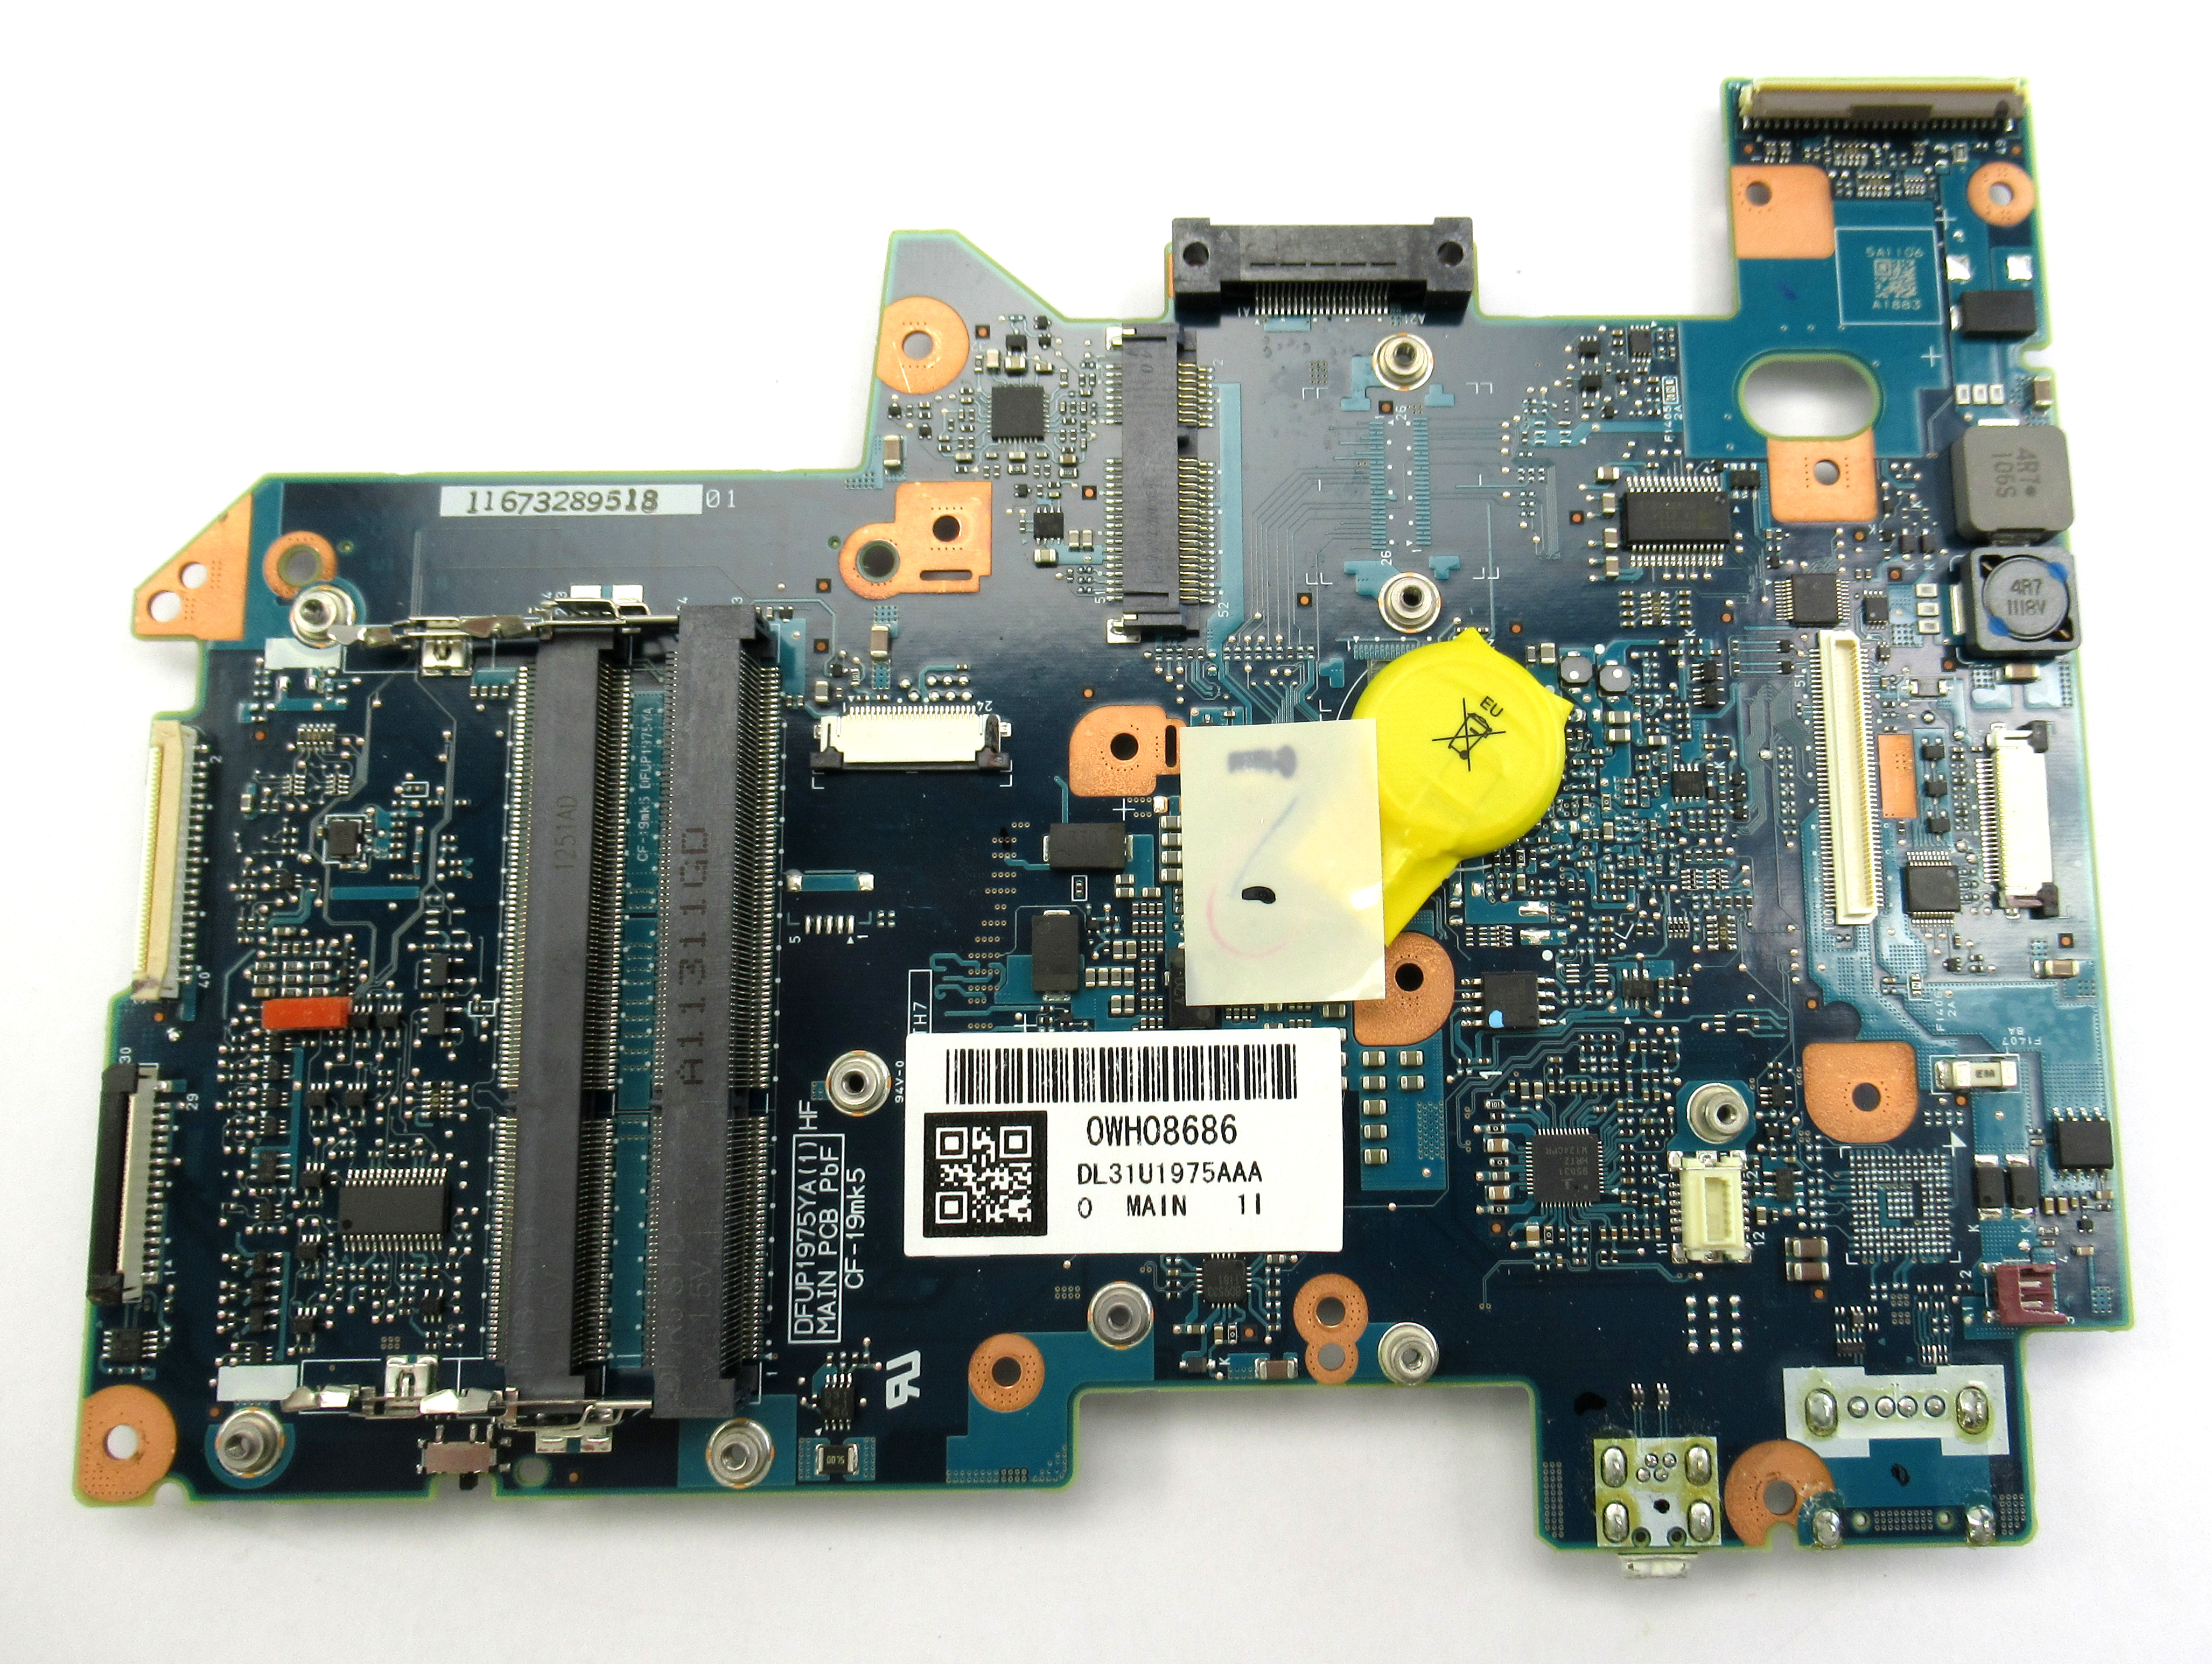 Panasonic CF-19 Toughbook Laptop Motherboard DL31U1975AAA i5-25220m